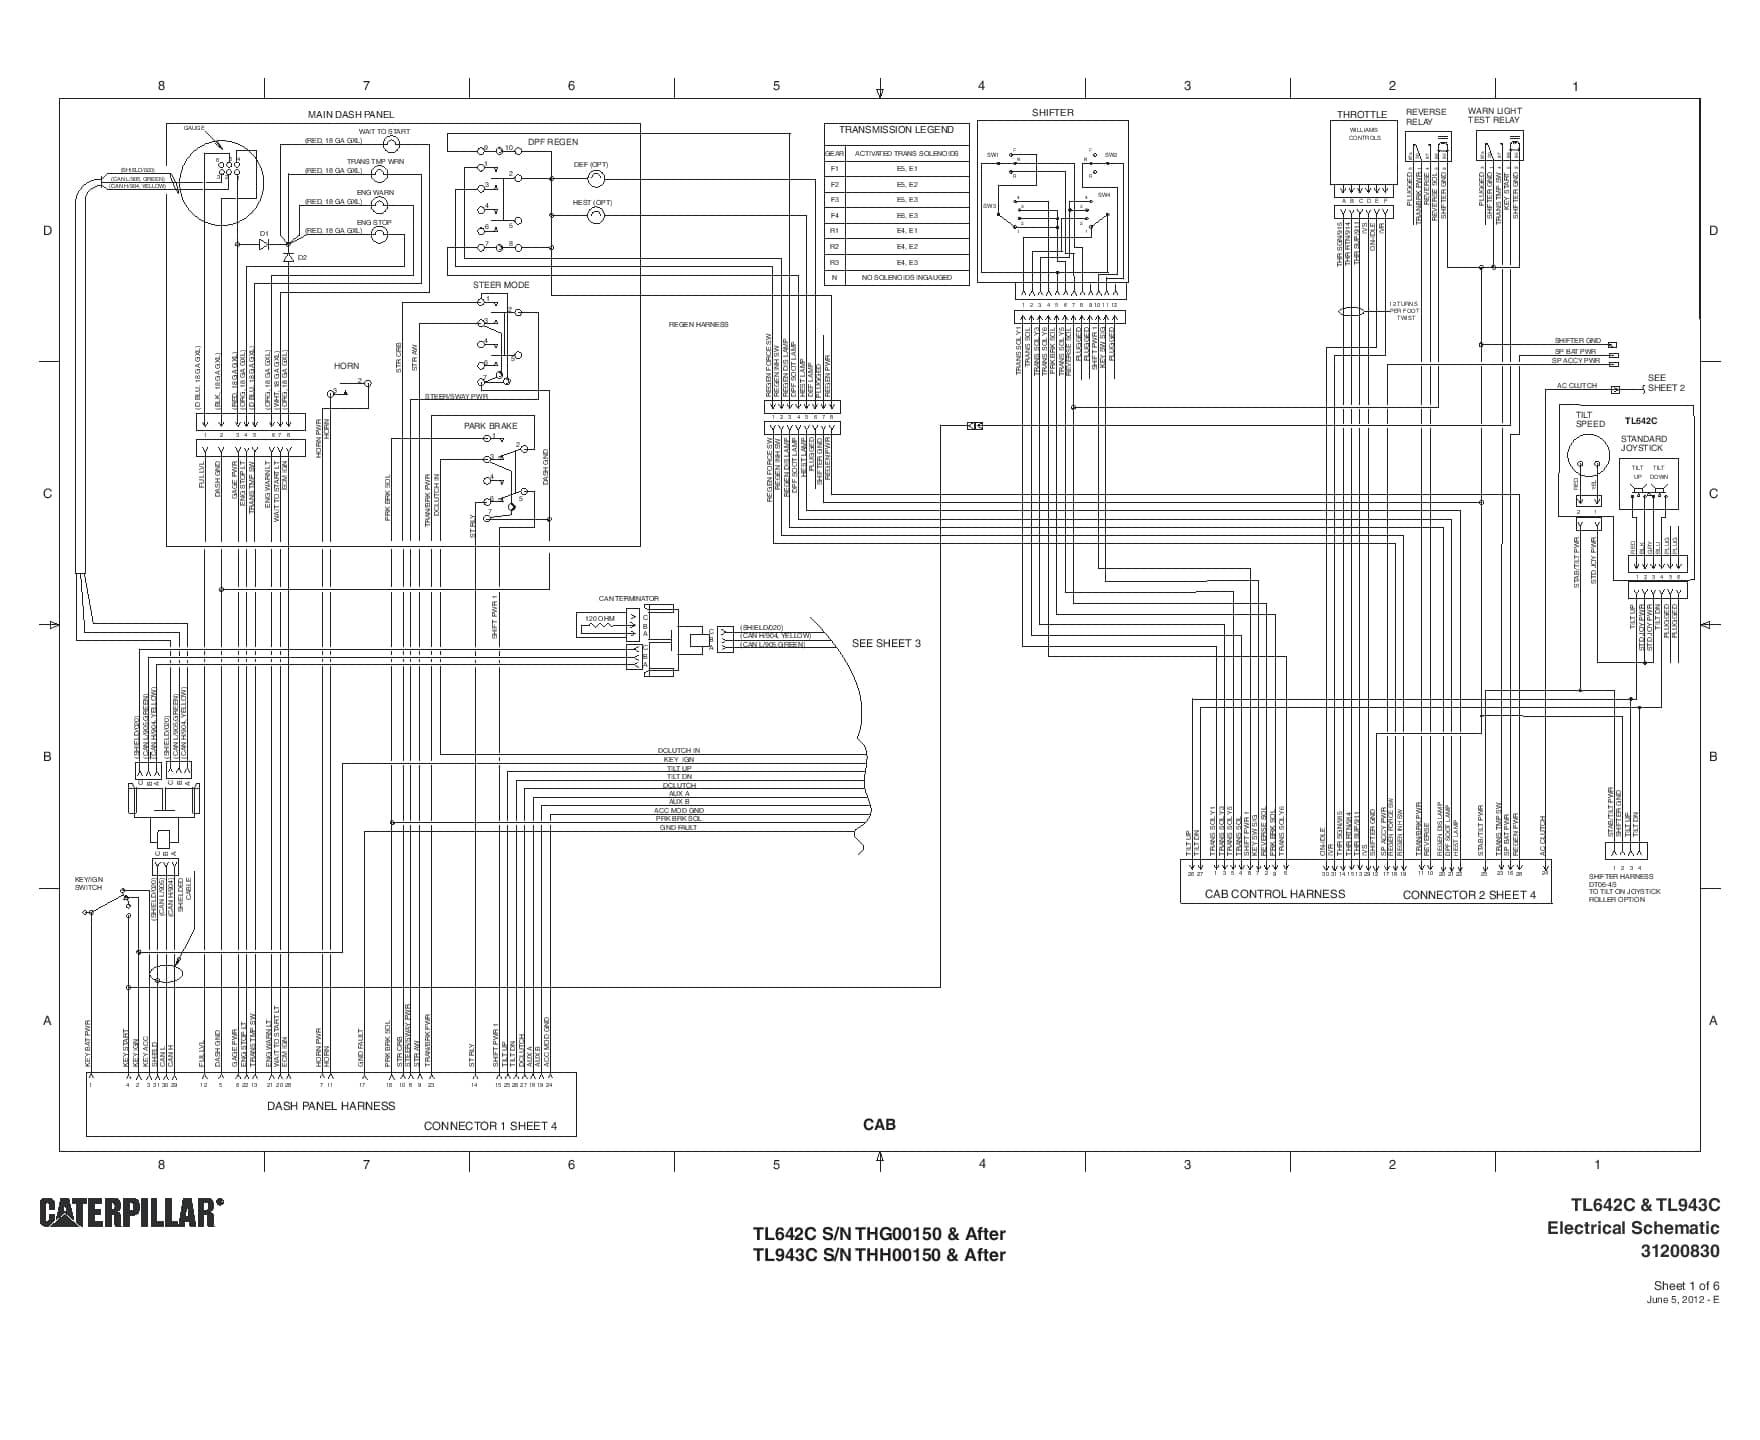 Cat Telehandler Tl642c Tl943c Electrical Schematic